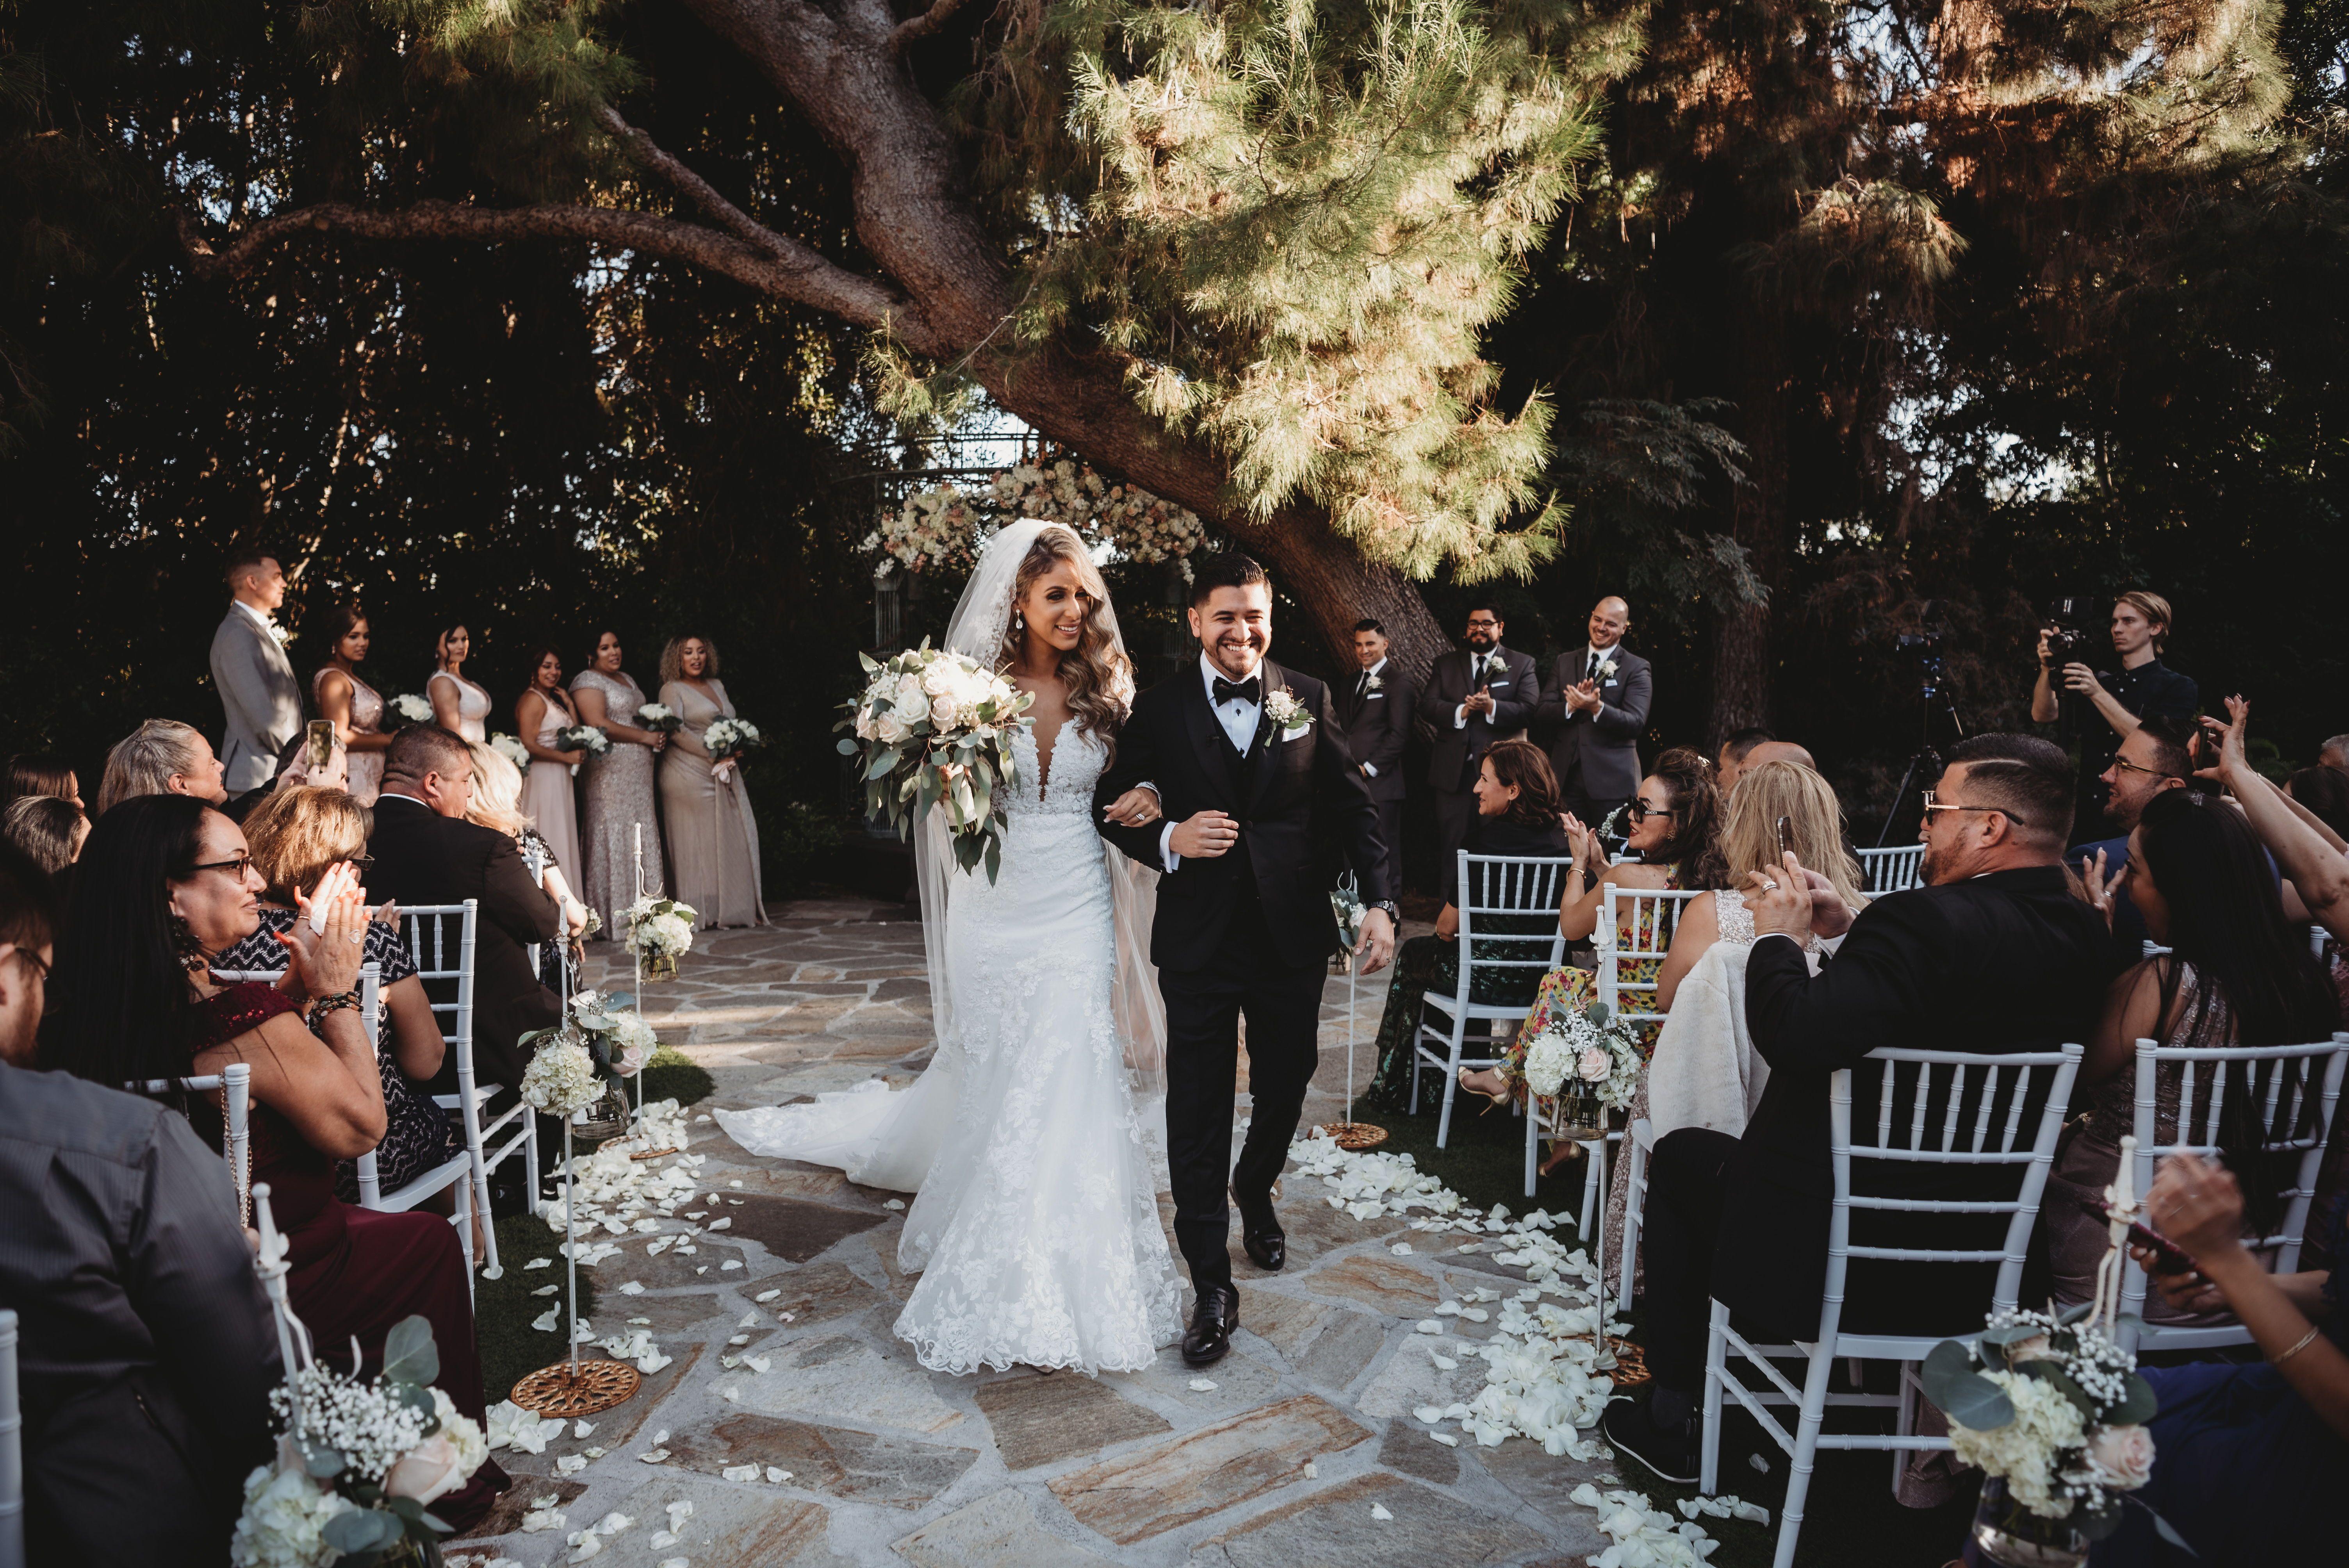 Blush And White Wedding Ceremony Green Gables Estate Wedding Janae Marie Photography White Wedding Ceremony Green Gables Wedding Estate Wedding Ceremony